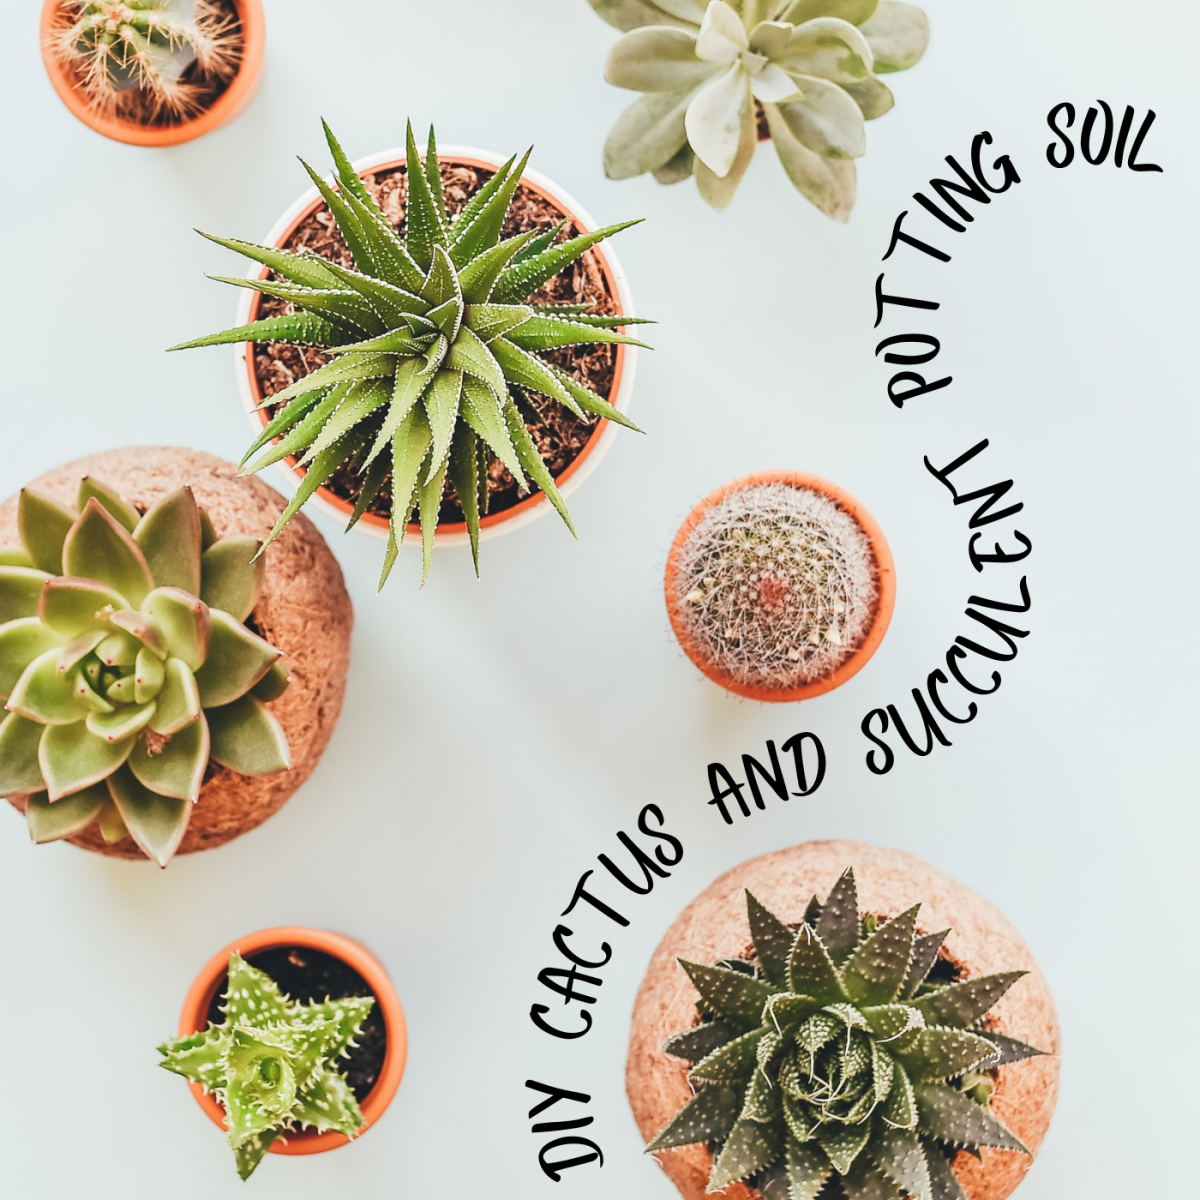 DIY cactus and succulent potting soil